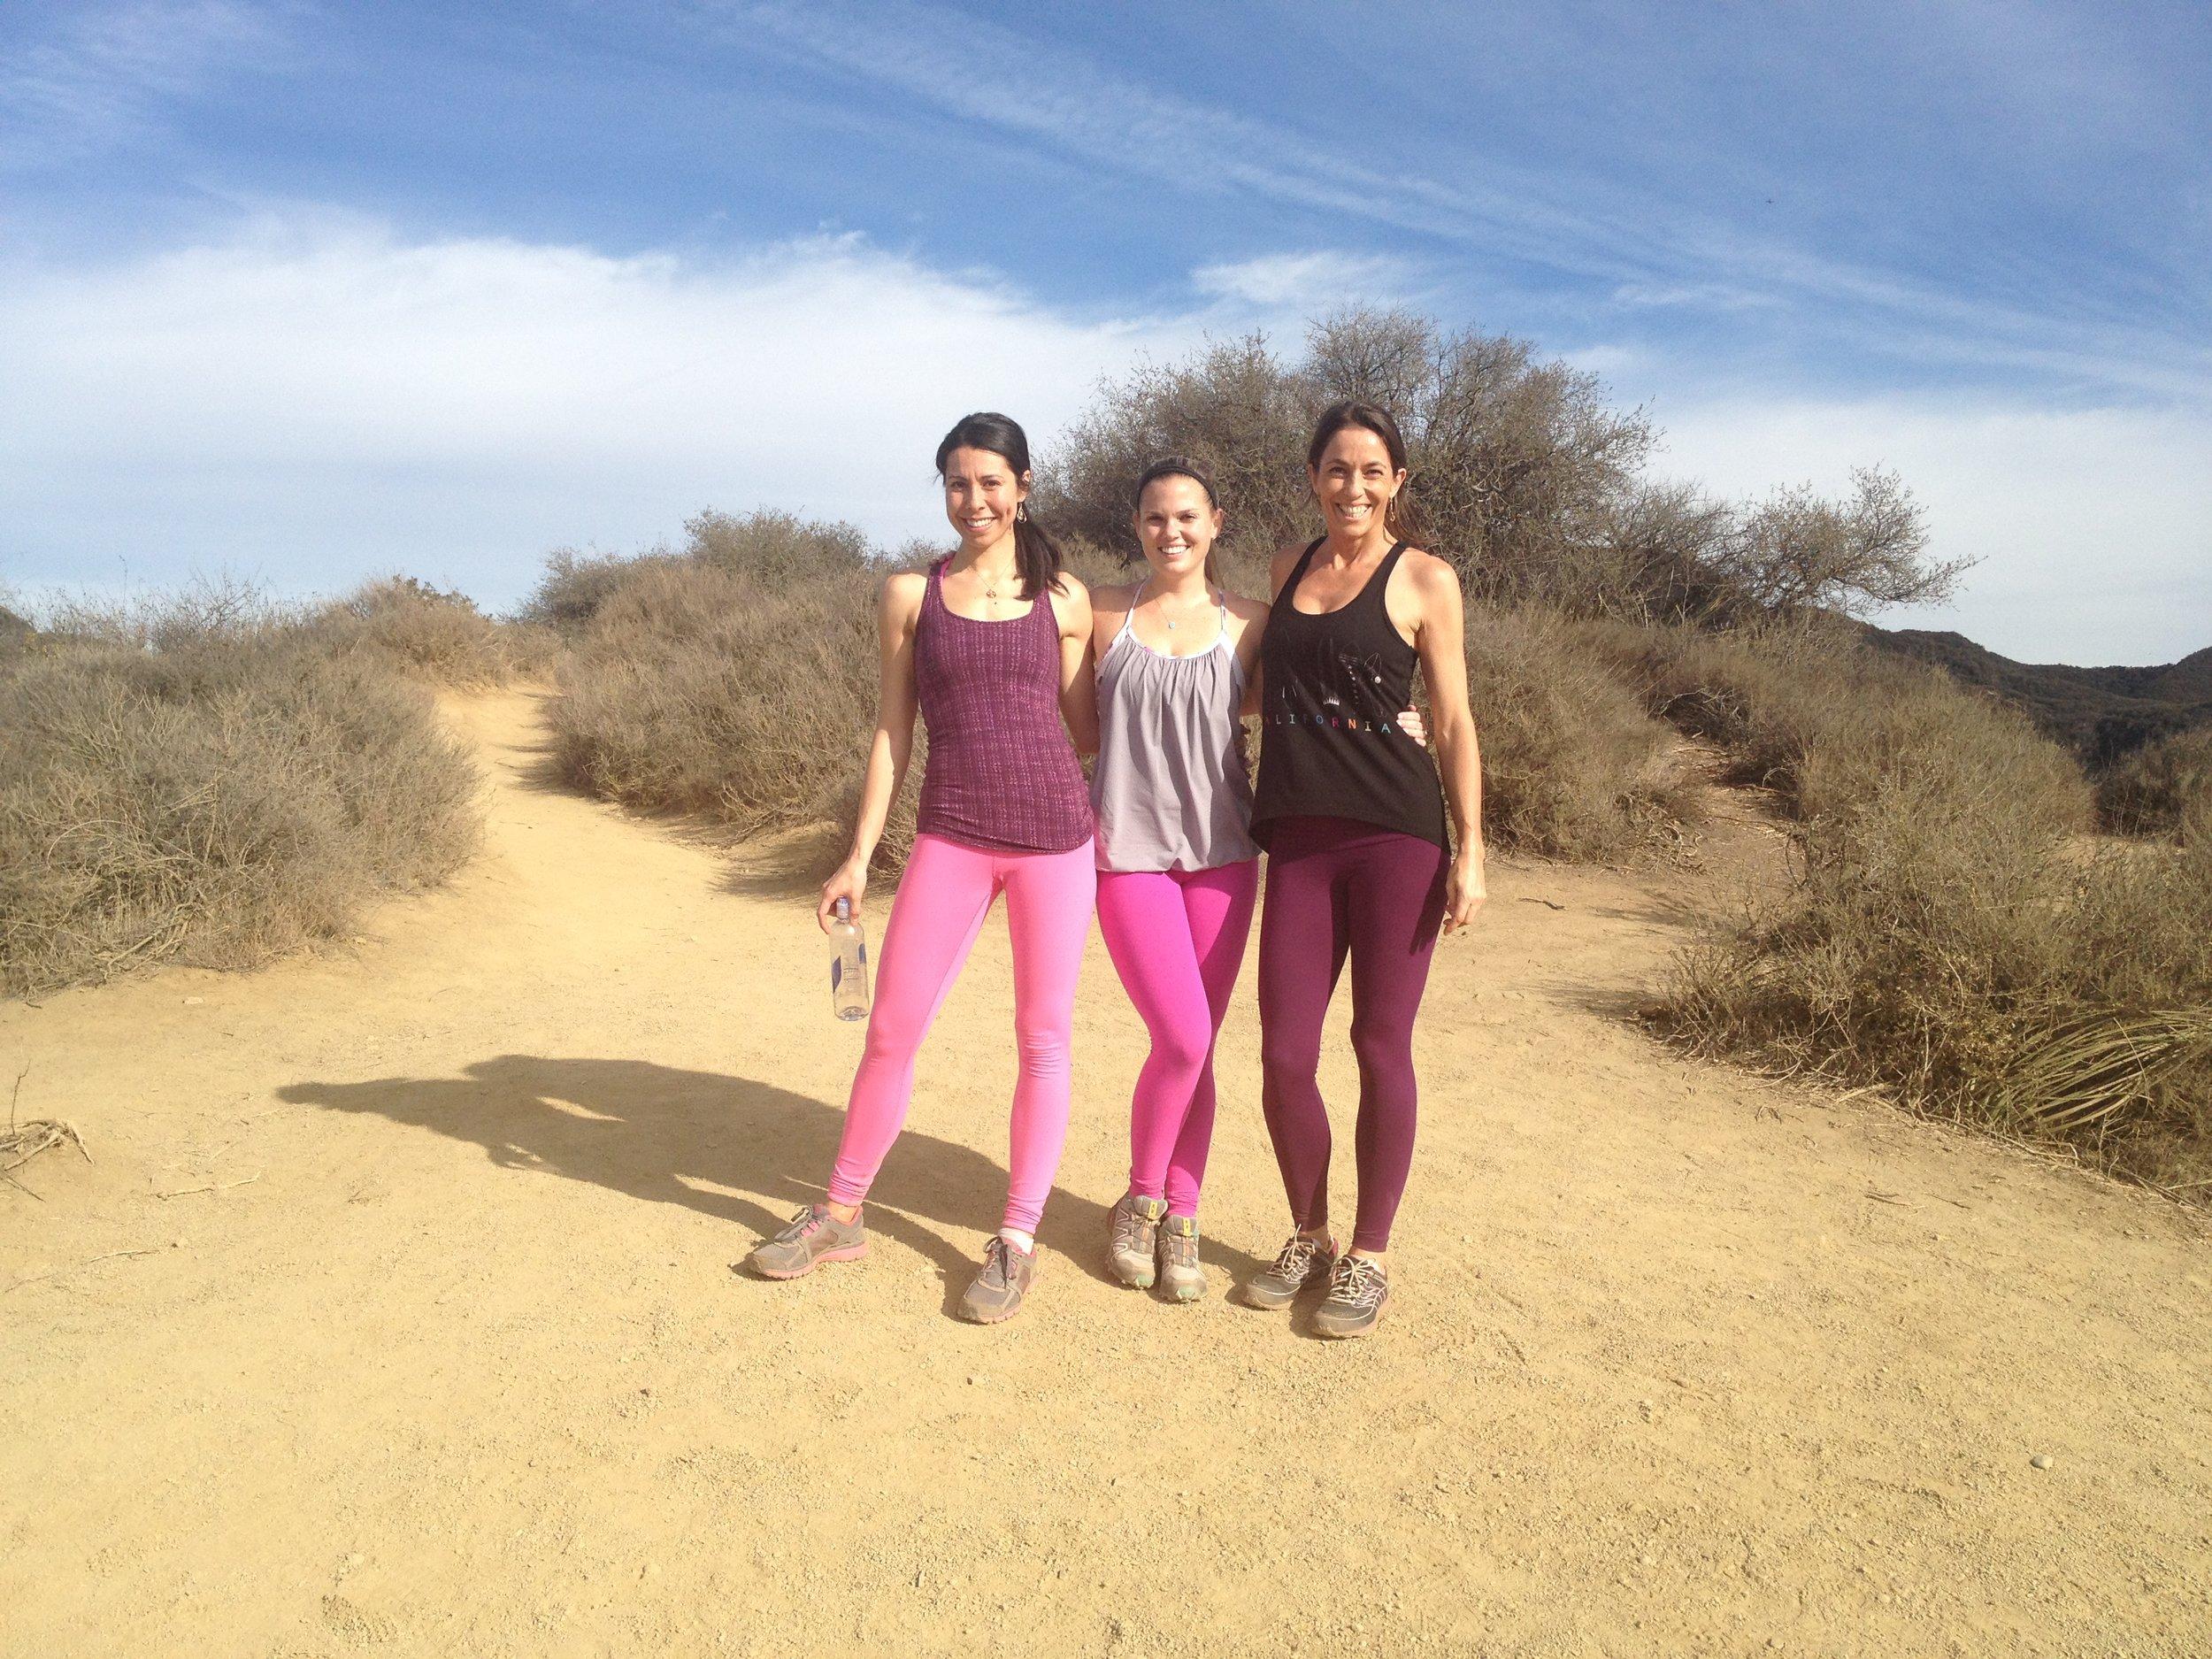 my soul sister Steph and goddess like guru yoga teacher Kia Miller